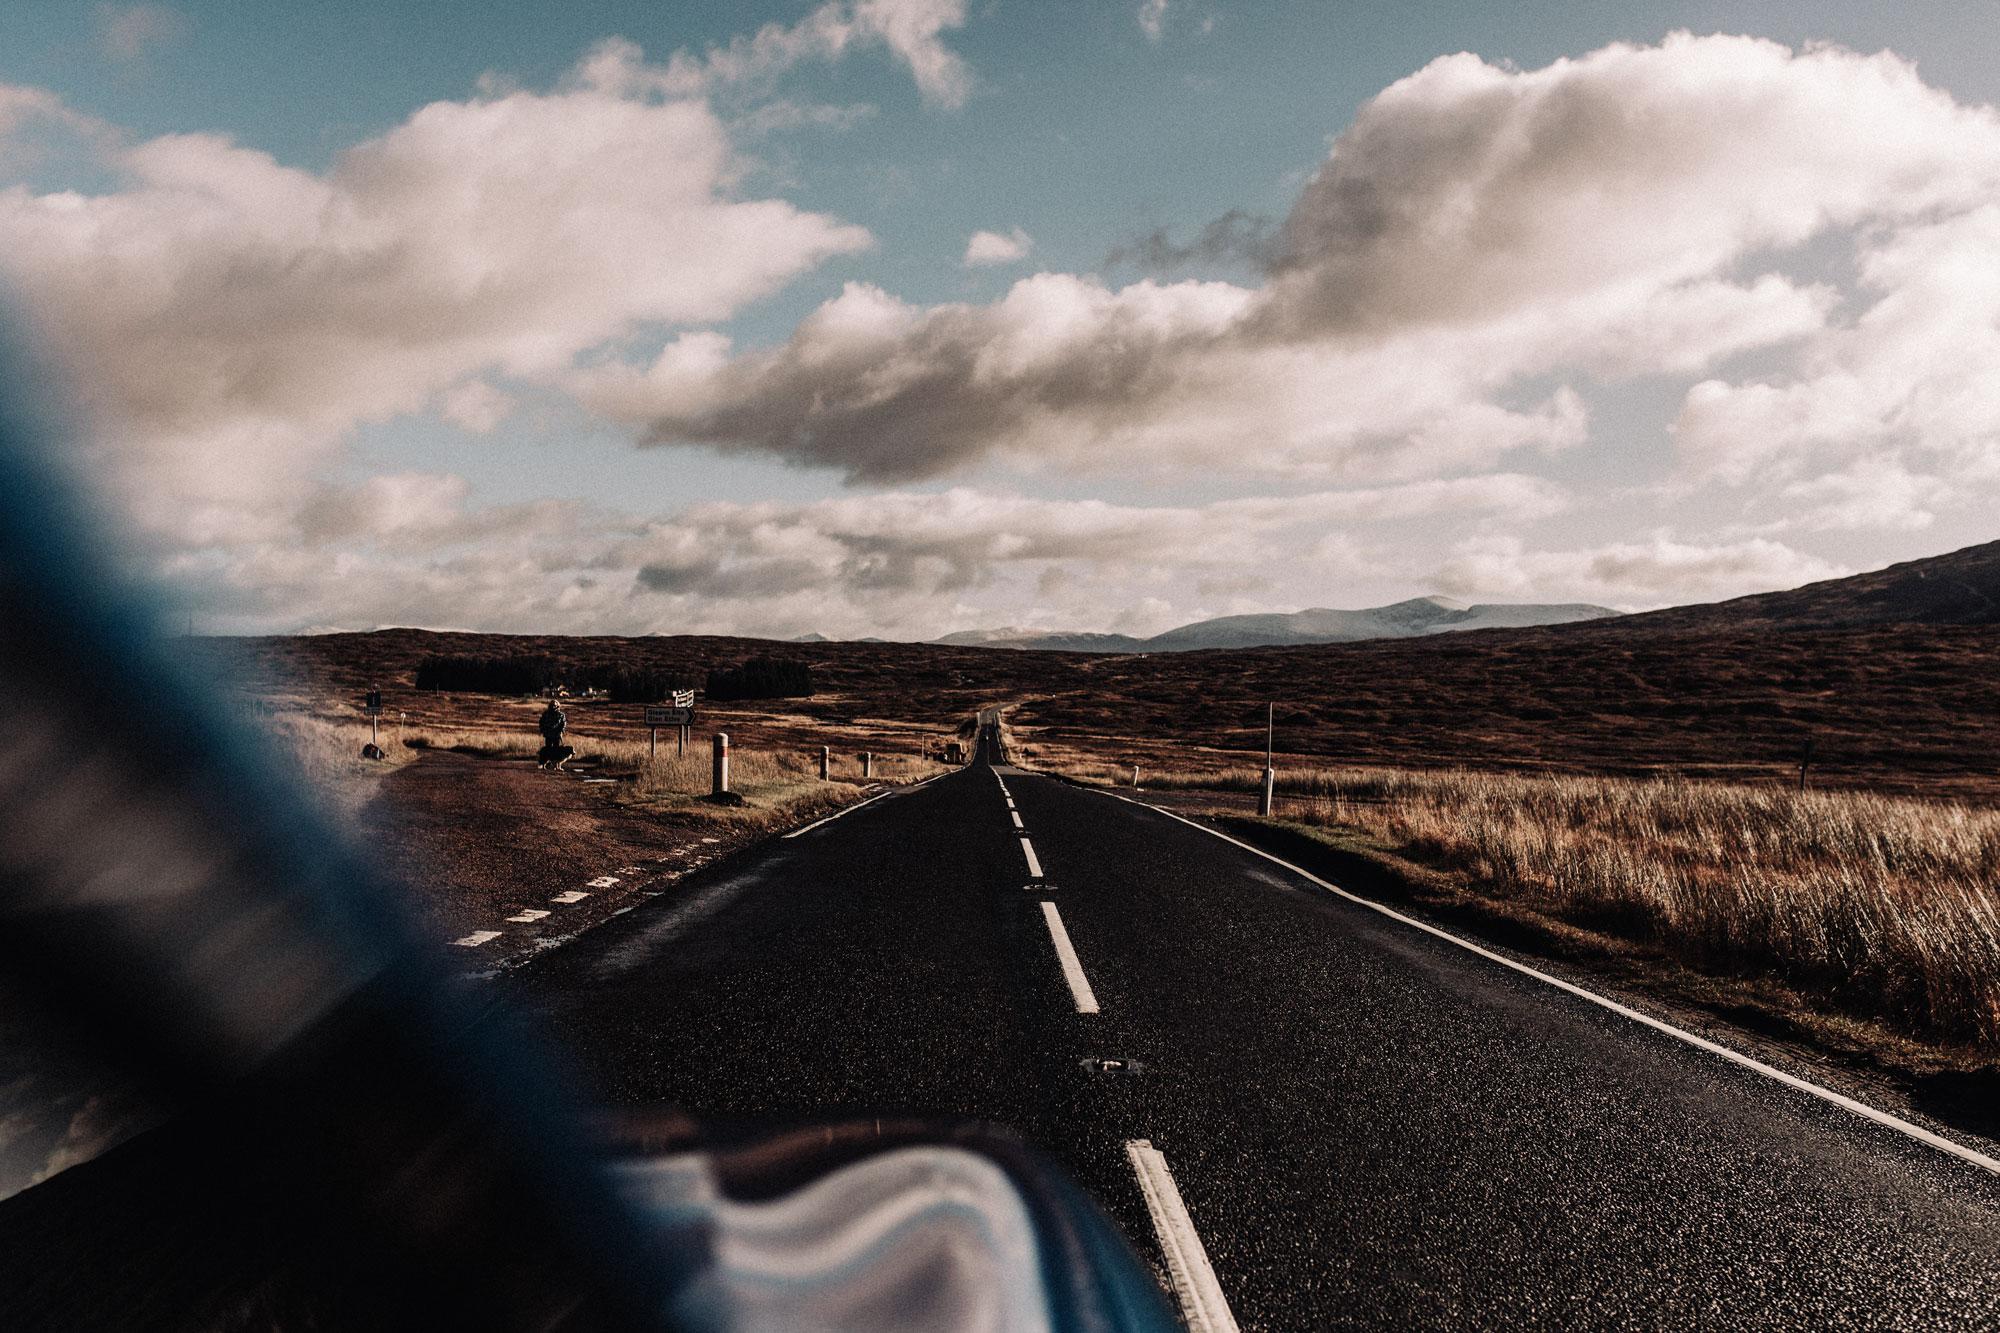 Schottland Roadtrip | Hörbuch Tipps | Landschaft | Highlands | Lieblingshörbuch | Audible | Empfehlung | Erfahrung | Reise | Urlaub | Natur | Fotografie | Strasse